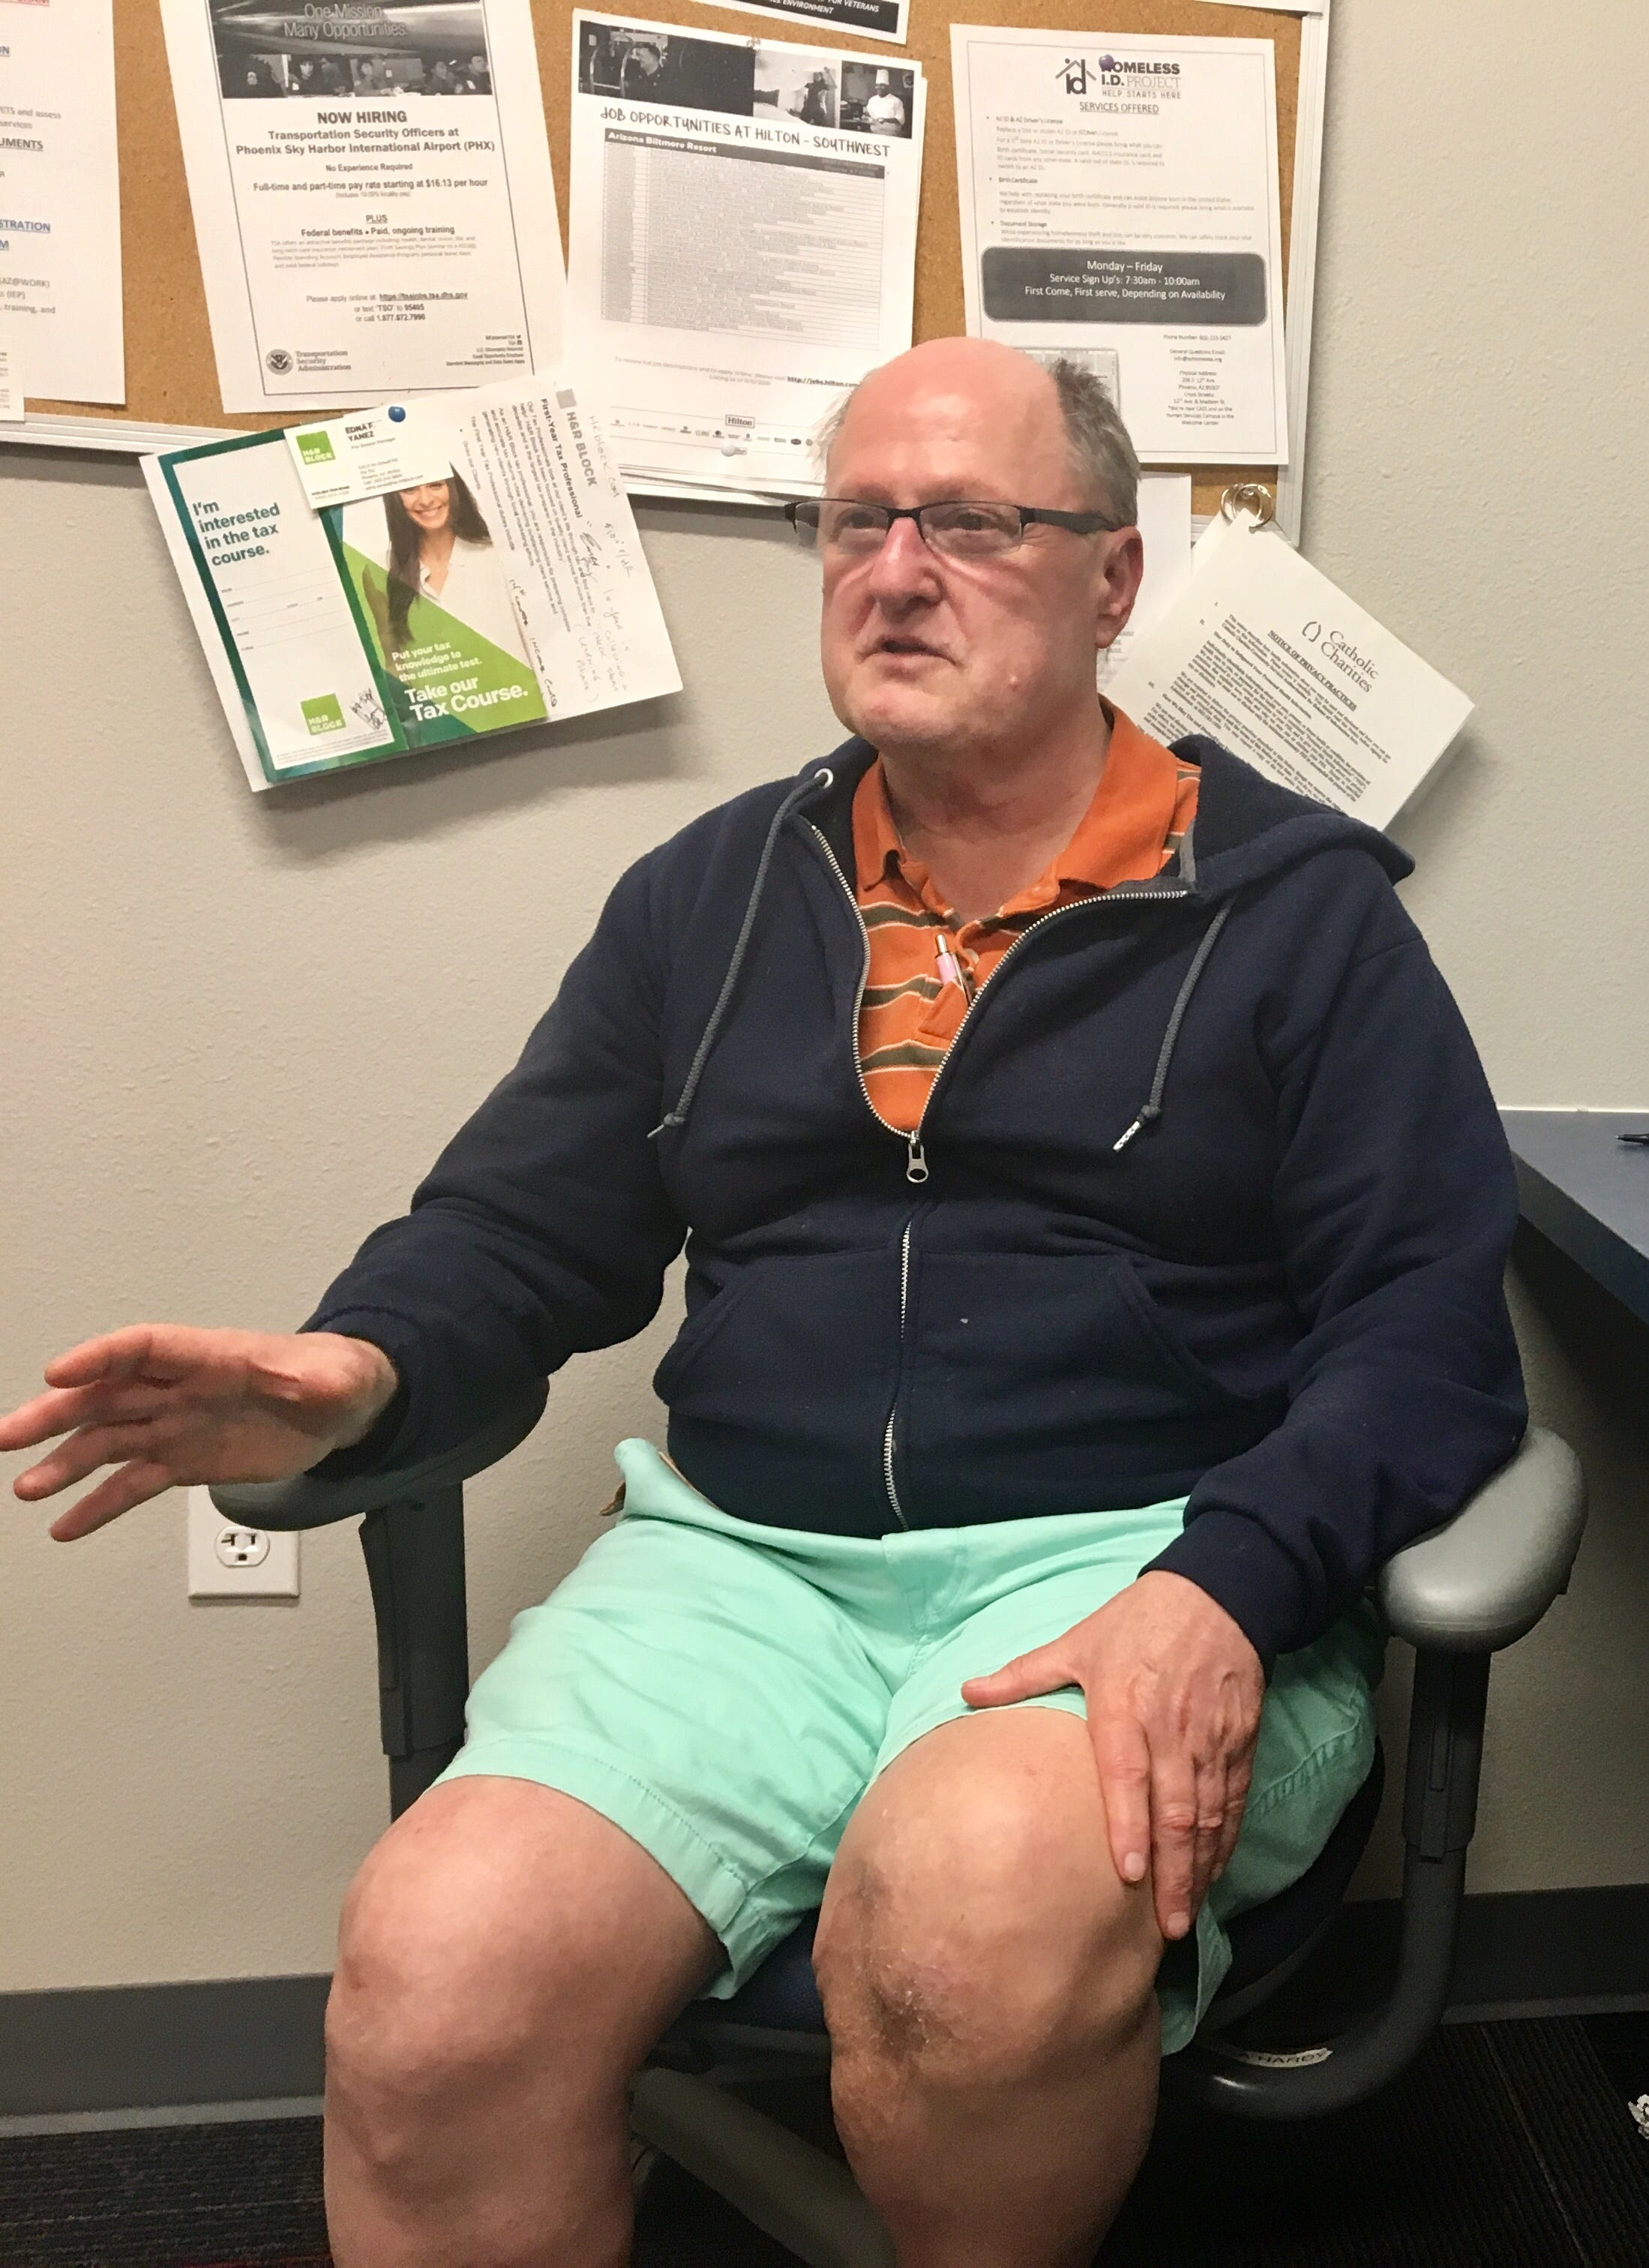 Rex Neighbors, 62, a Navy veteran, talks about the help he got at Catholic Charities' MANA House, a transitional living program for homeless veterans.